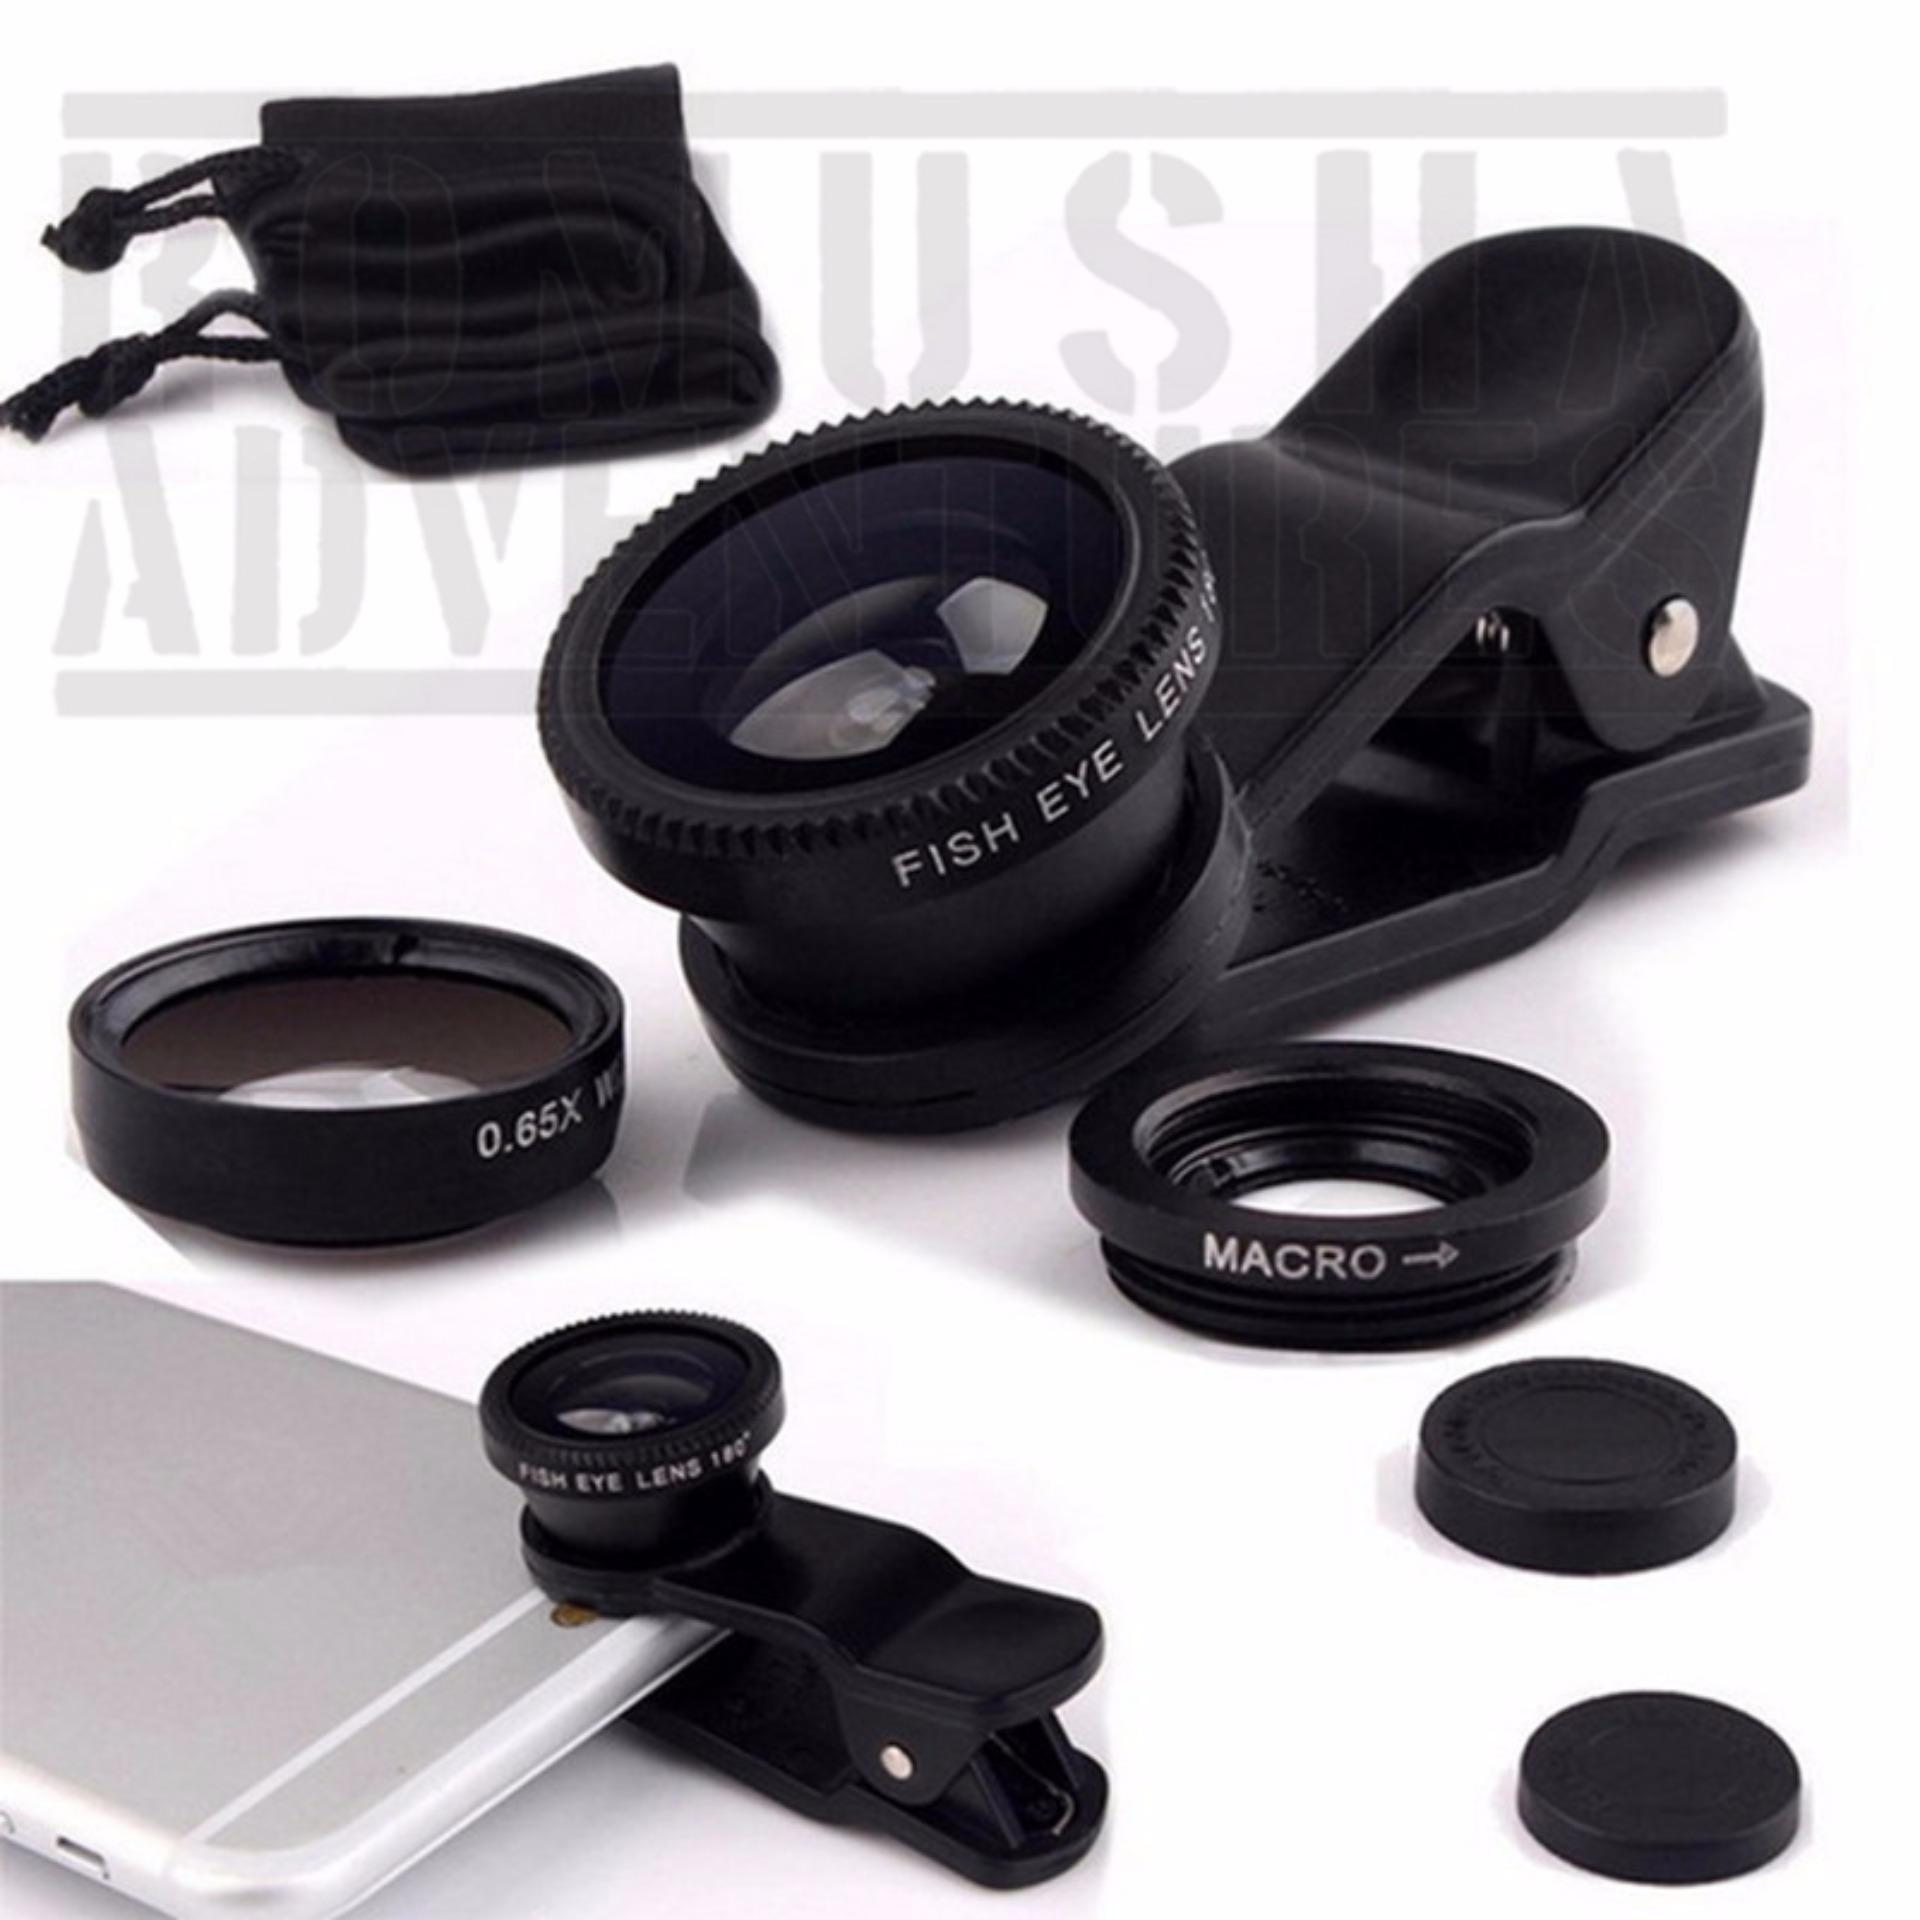 Romusha Lensa Super Wide 04x Selfie Camera For Smartphone Hp Spec Newtech Eagle Eye Fish